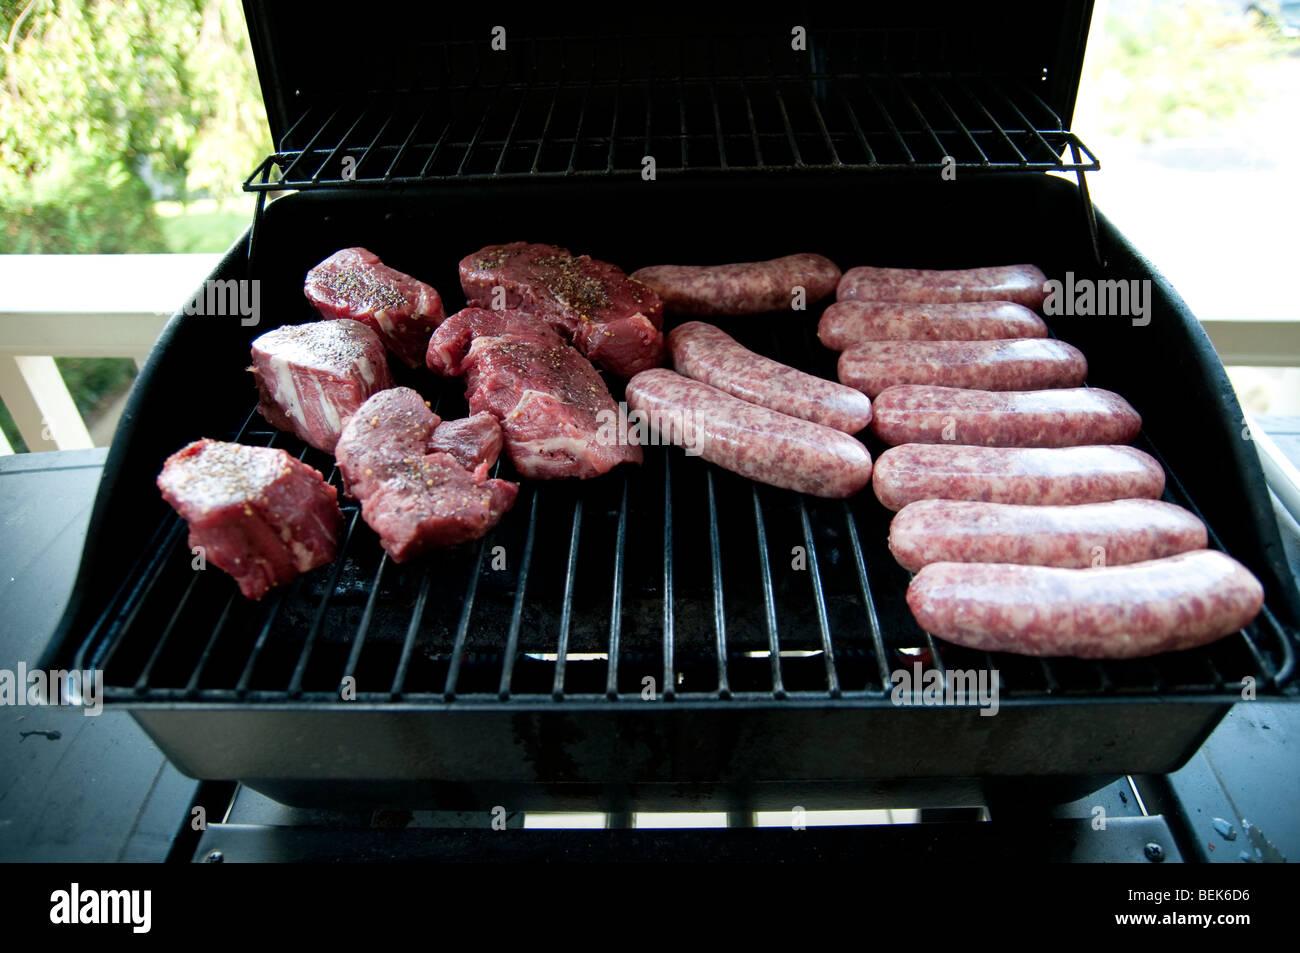 Erfahrene rohes Steak Koteletts auf einem BBQ-Grill Stockbild